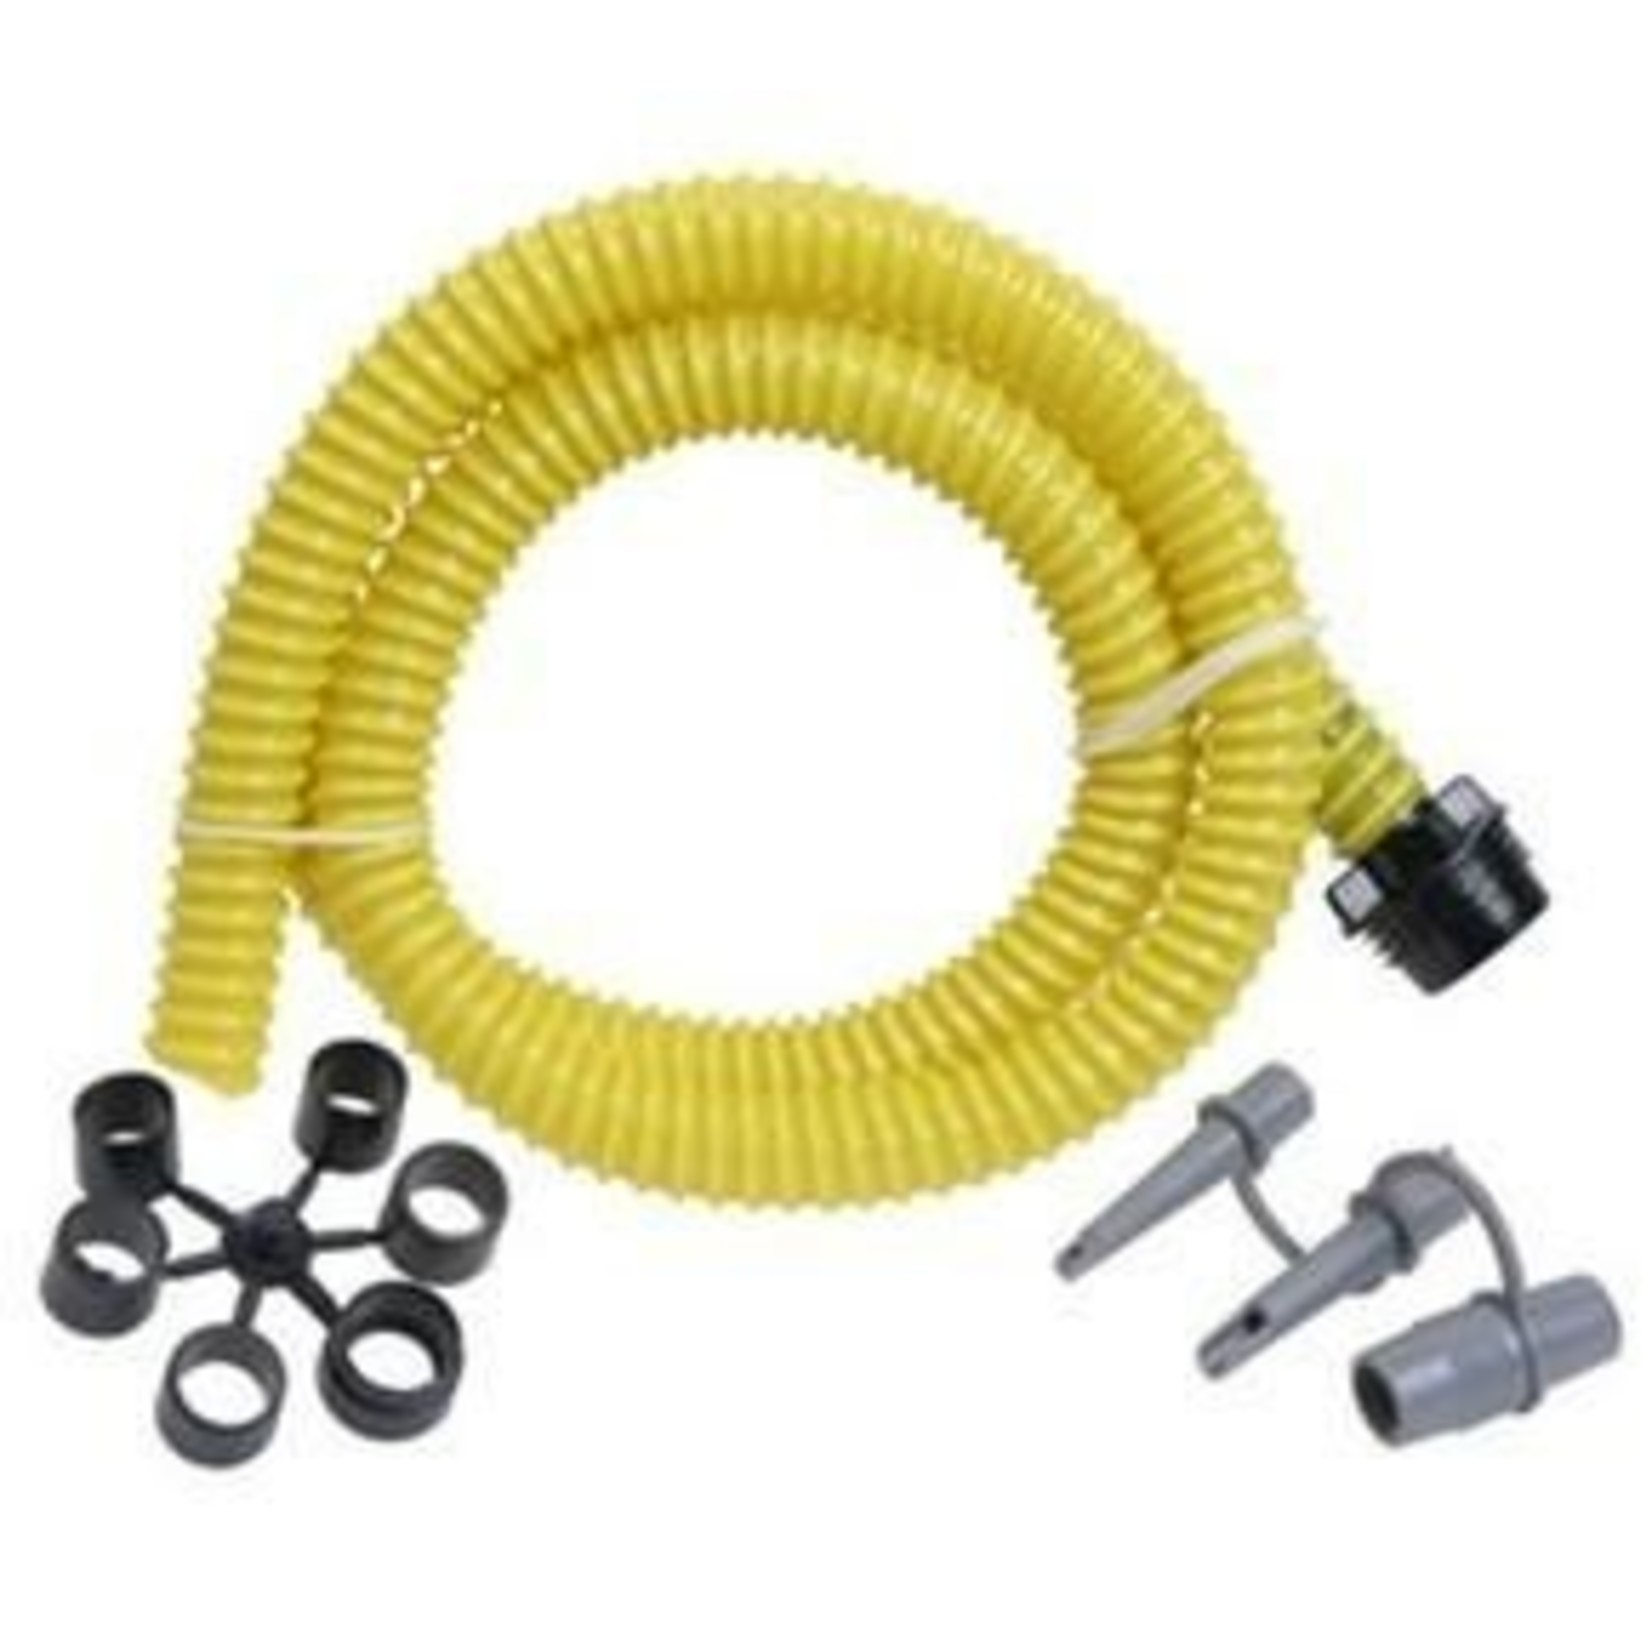 Scoprega Bravo hose for footpump with adapterset